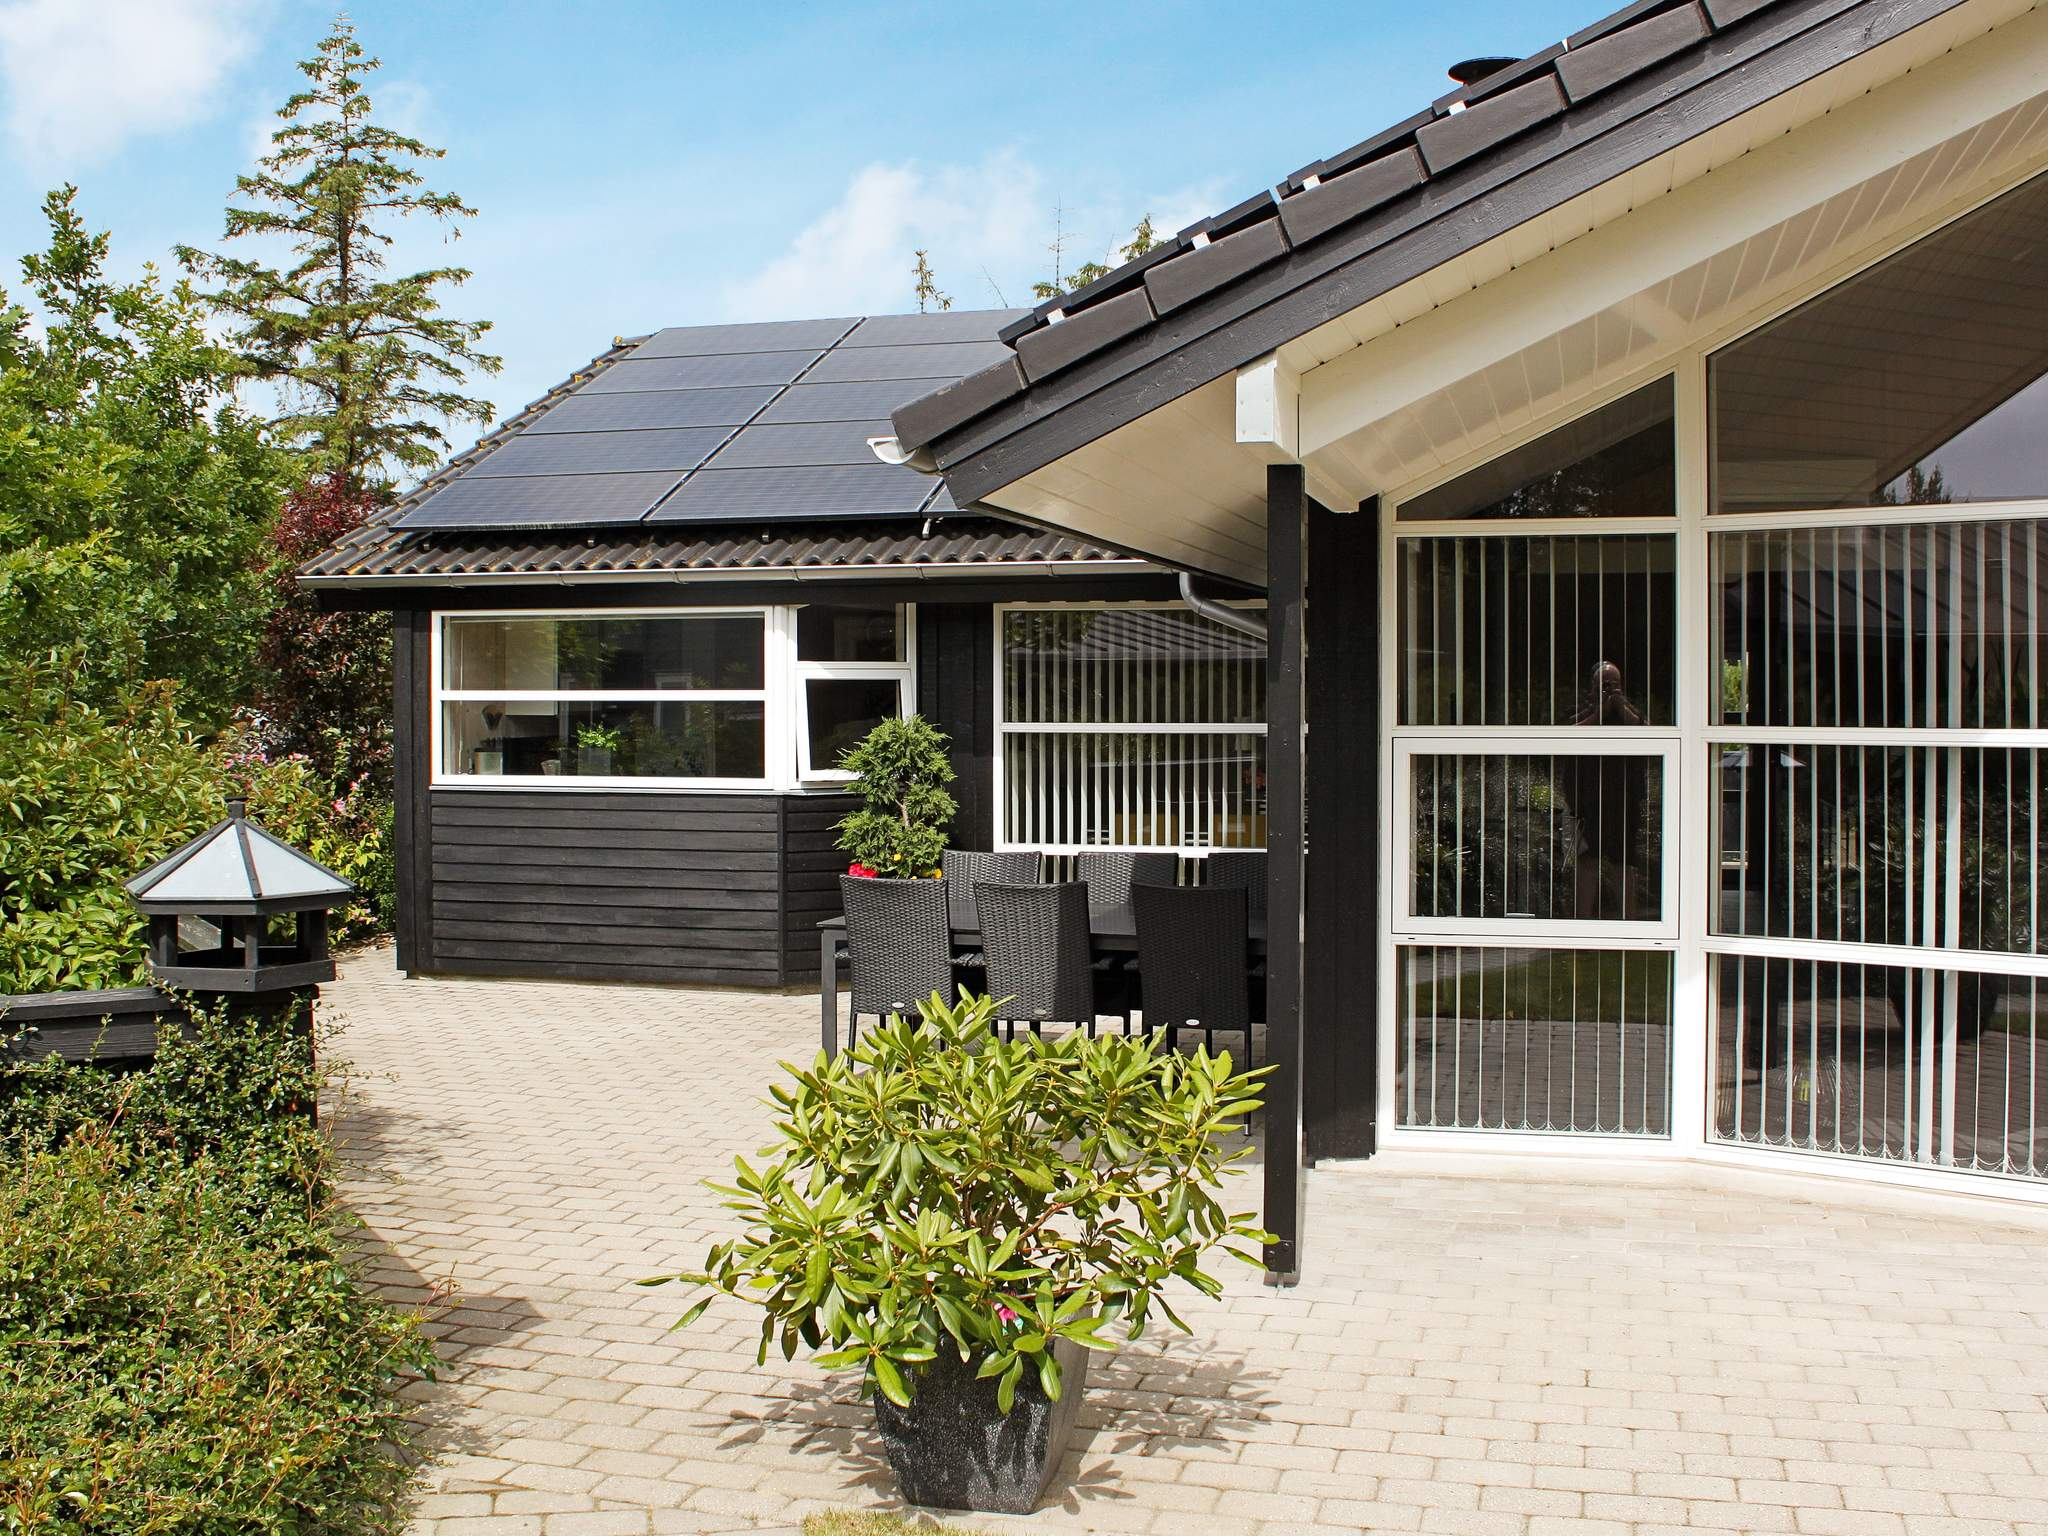 Ferienhaus Blåvand (335970), Blåvand, , Westjütland, Dänemark, Bild 28